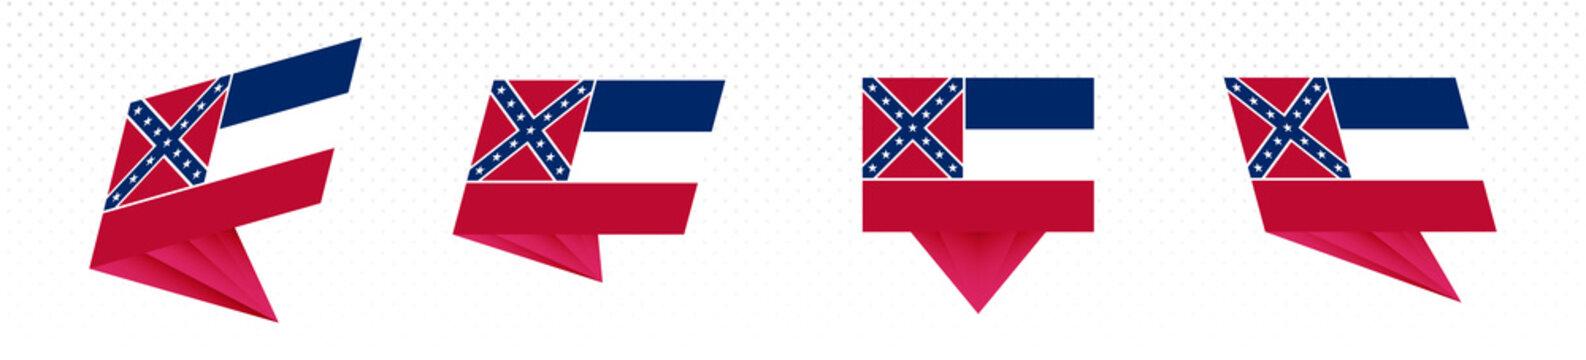 Flag of Mississippi US State in modern abstract design, flag set.